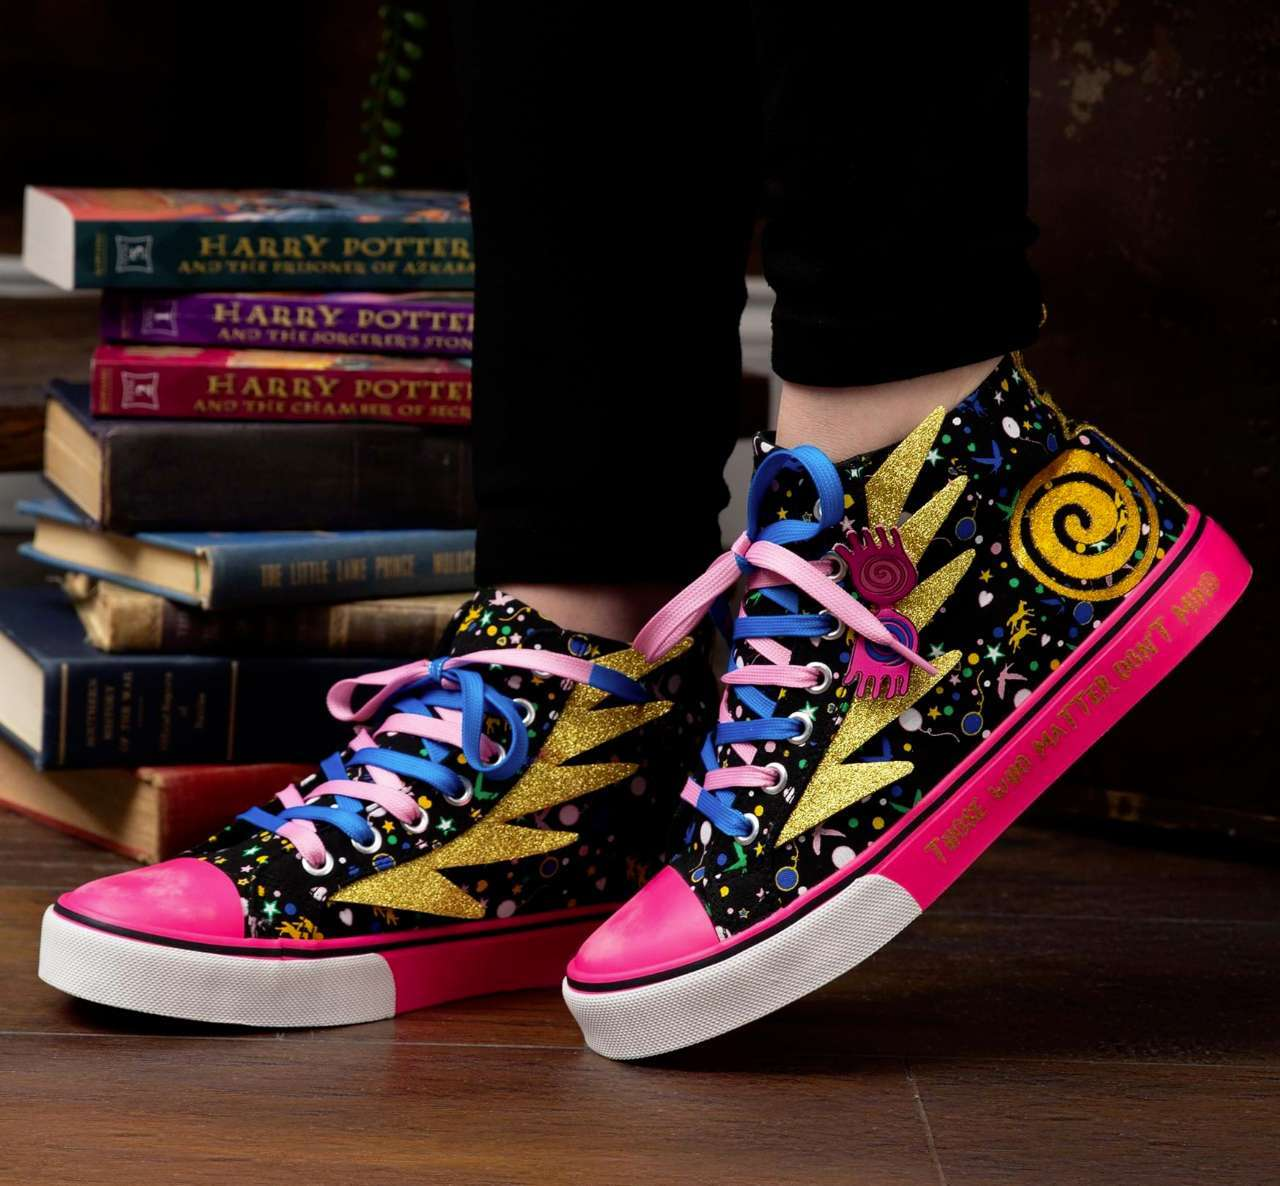 harry-potter-luna-lovegood-sneakers-2